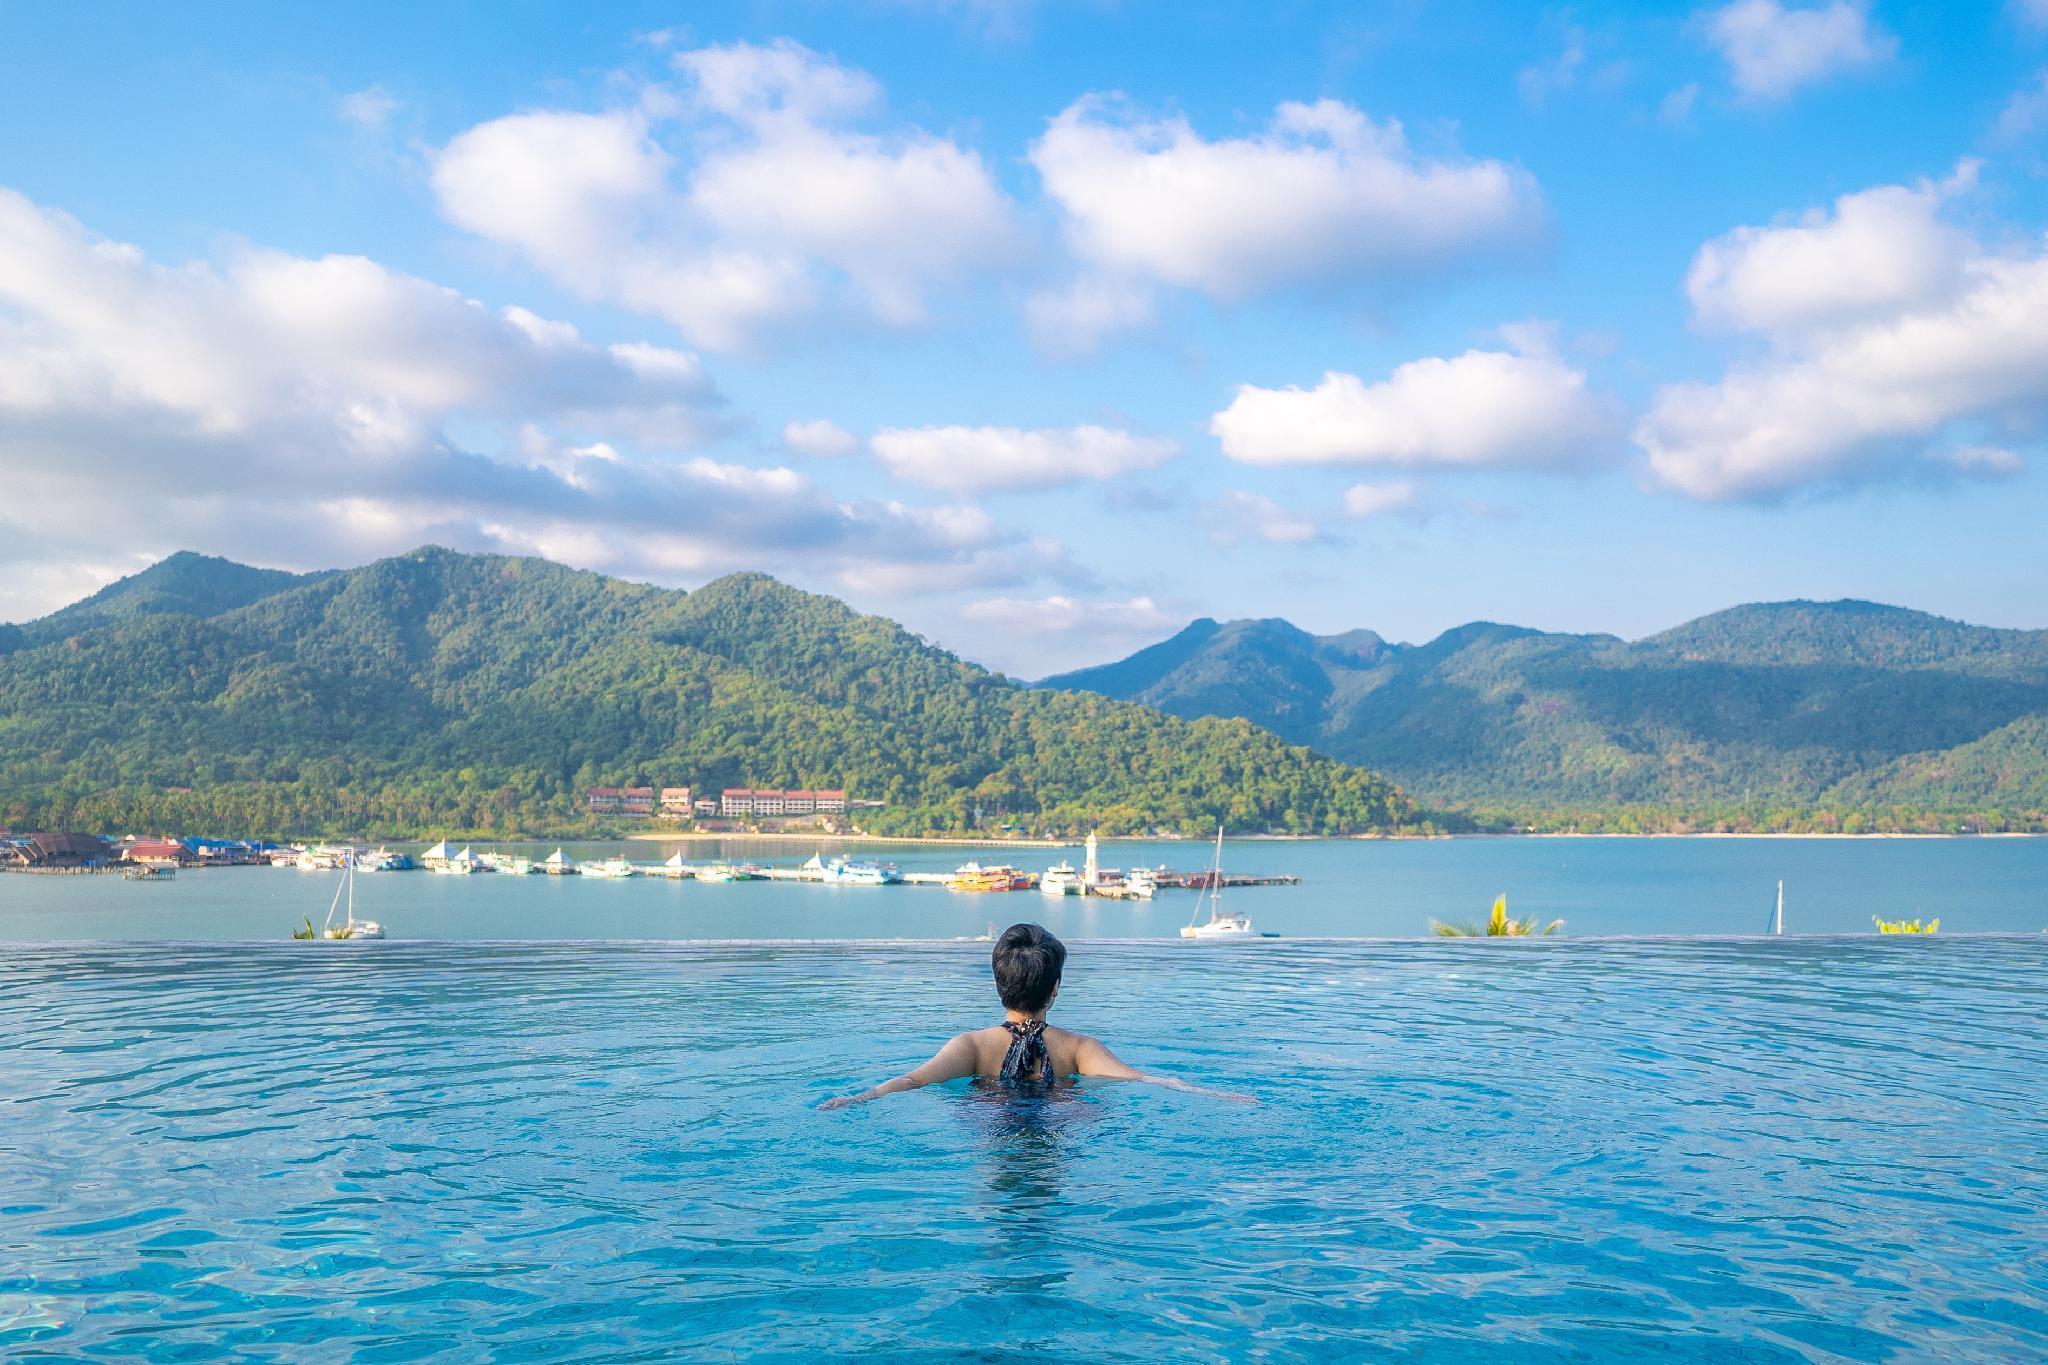 Bhuvarin Resort ภูวาริน รีสอร์ท